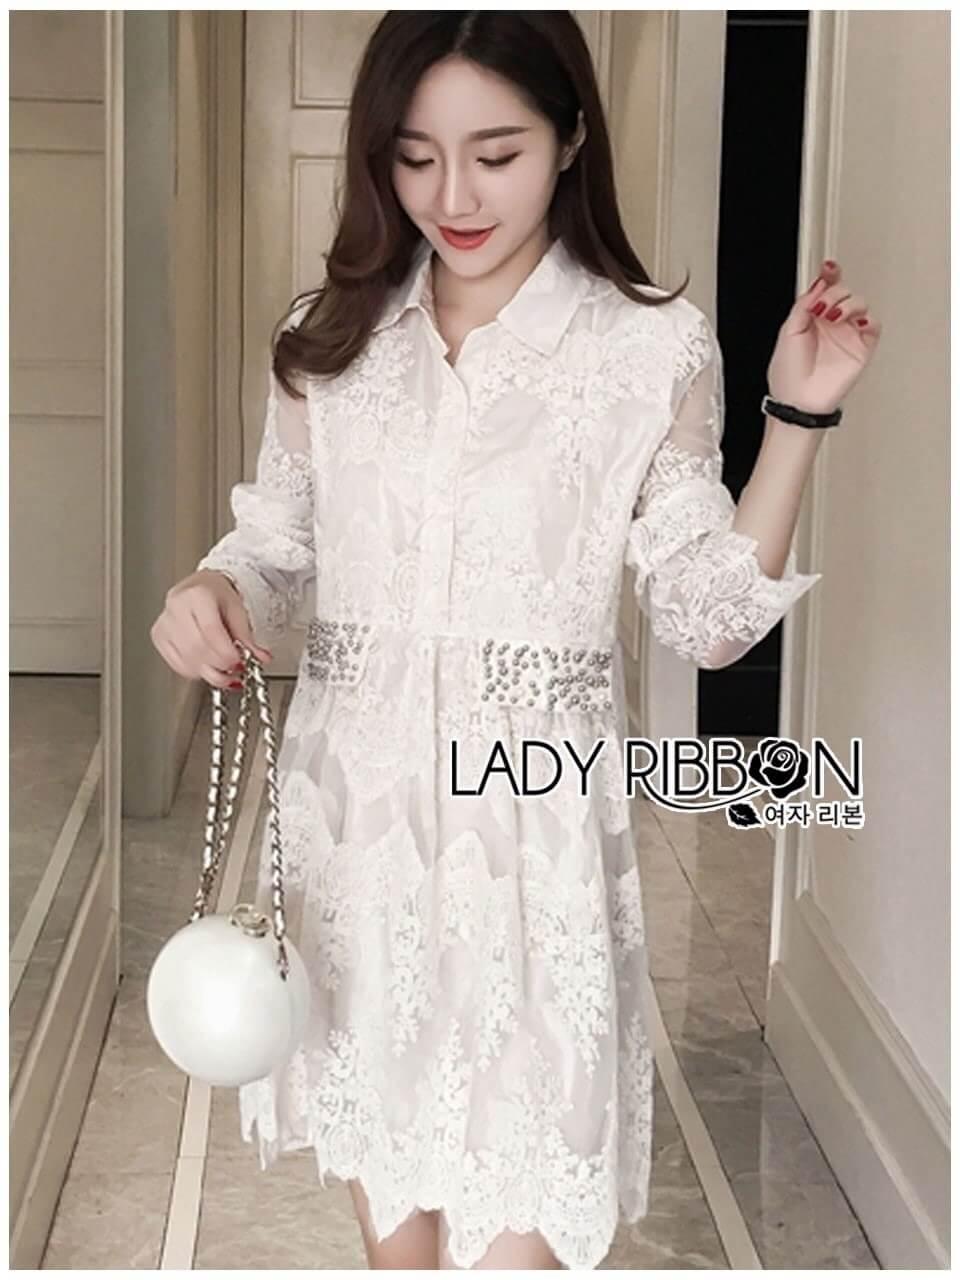 &#x1F380 Lady Ribbon's Made &#x1F380 Lady Leslie Classic Twist Studded White Lace Shirt Dress